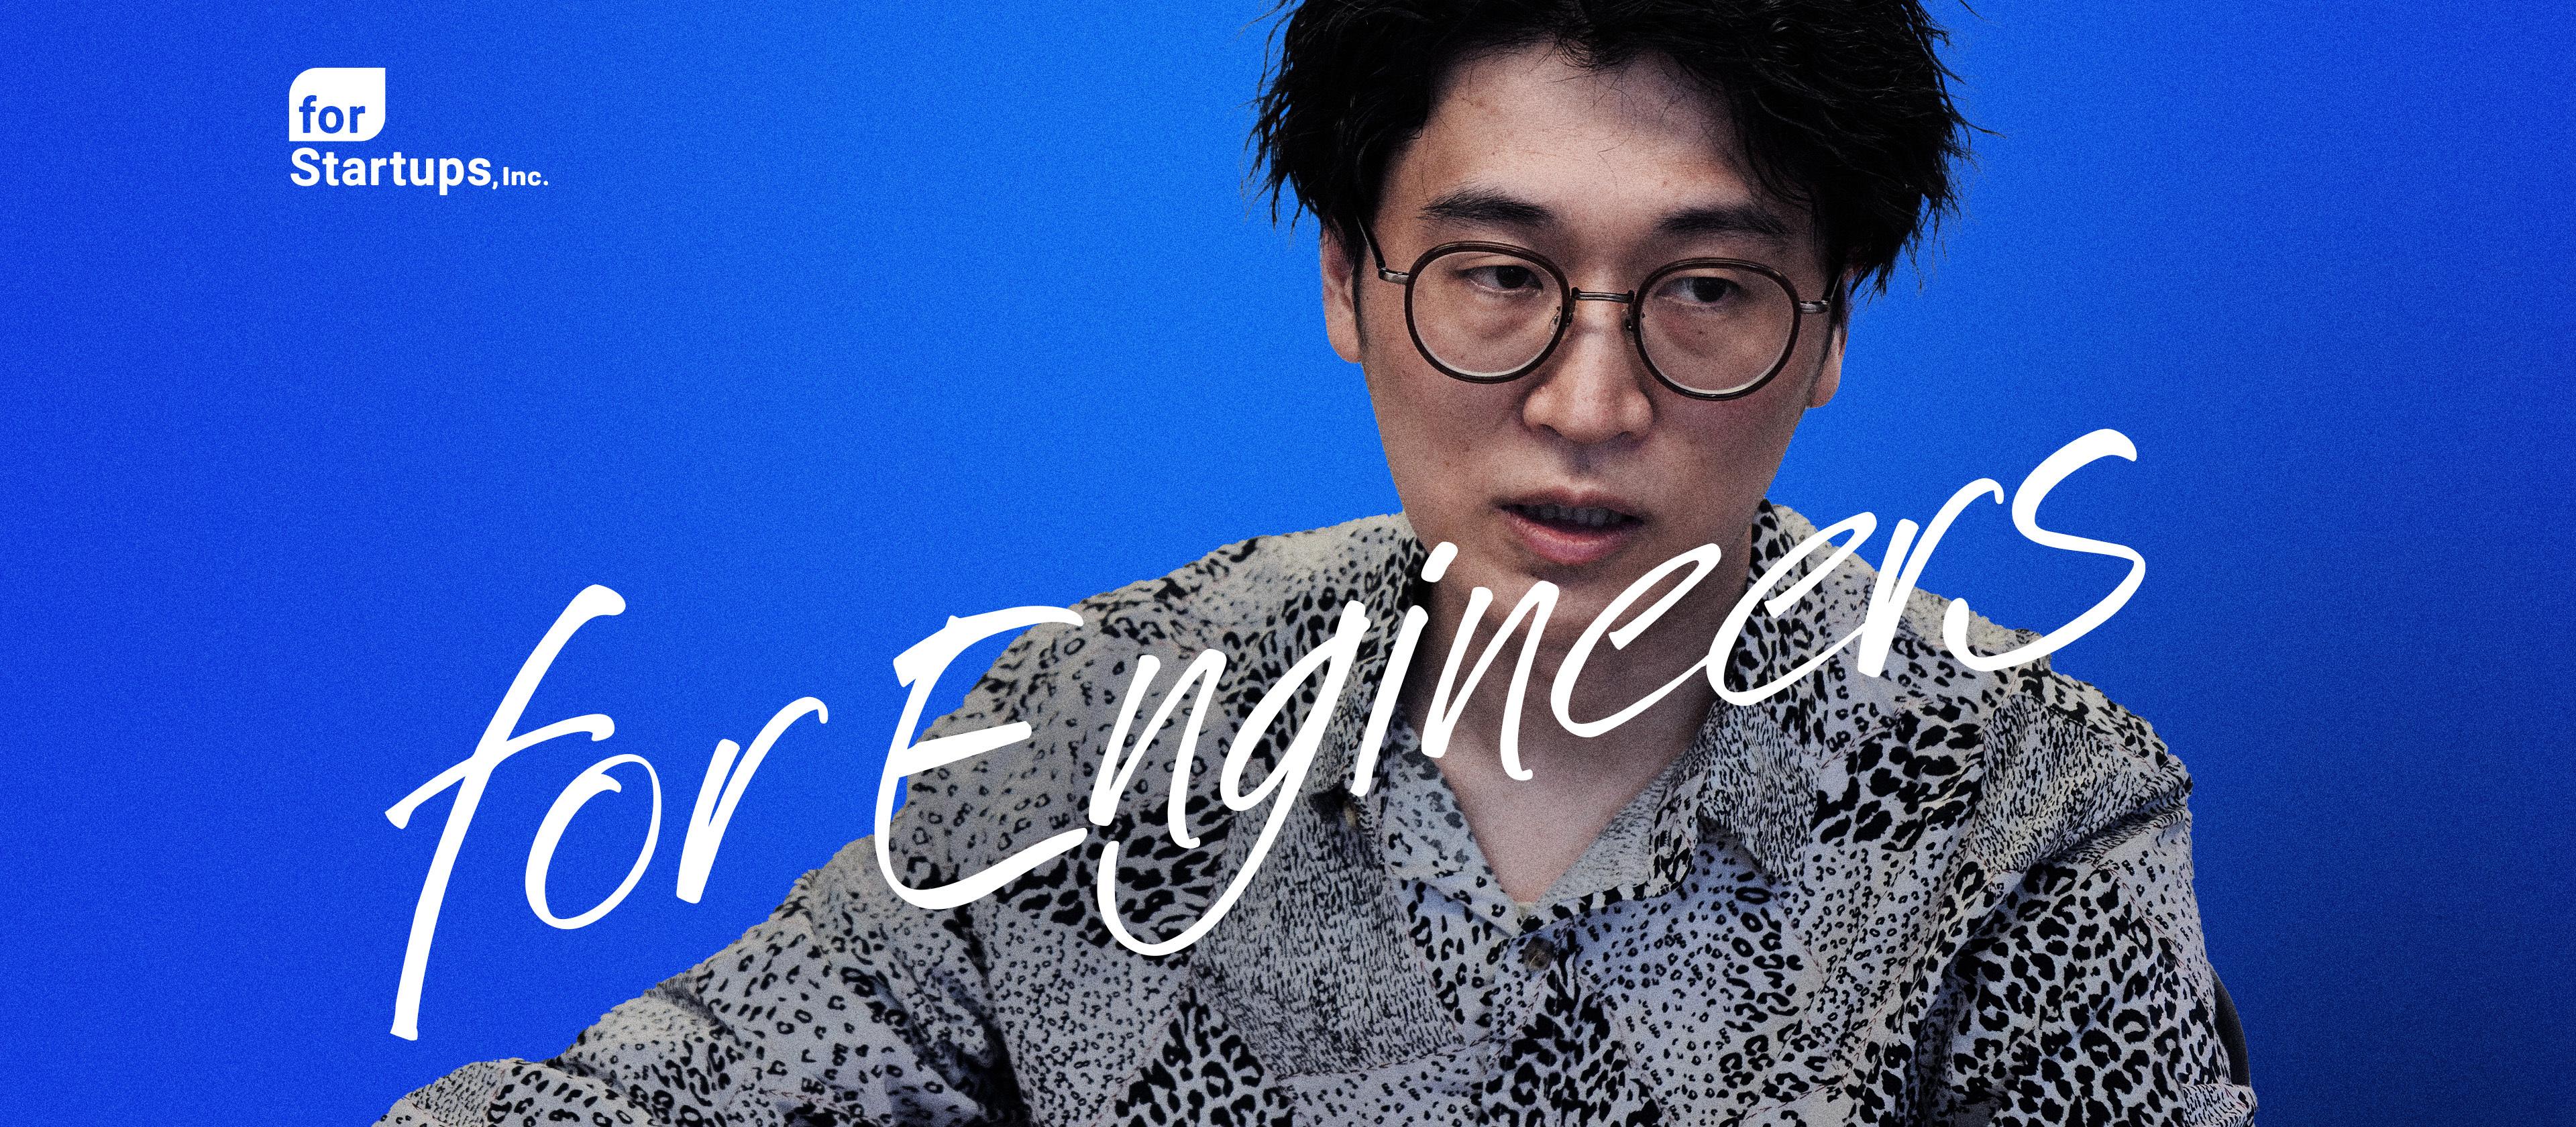 【HEROES7:カケハシ 高木氏】社会へのインパクトを求めてスタートアップへ。日本の医療体験を変える一助に